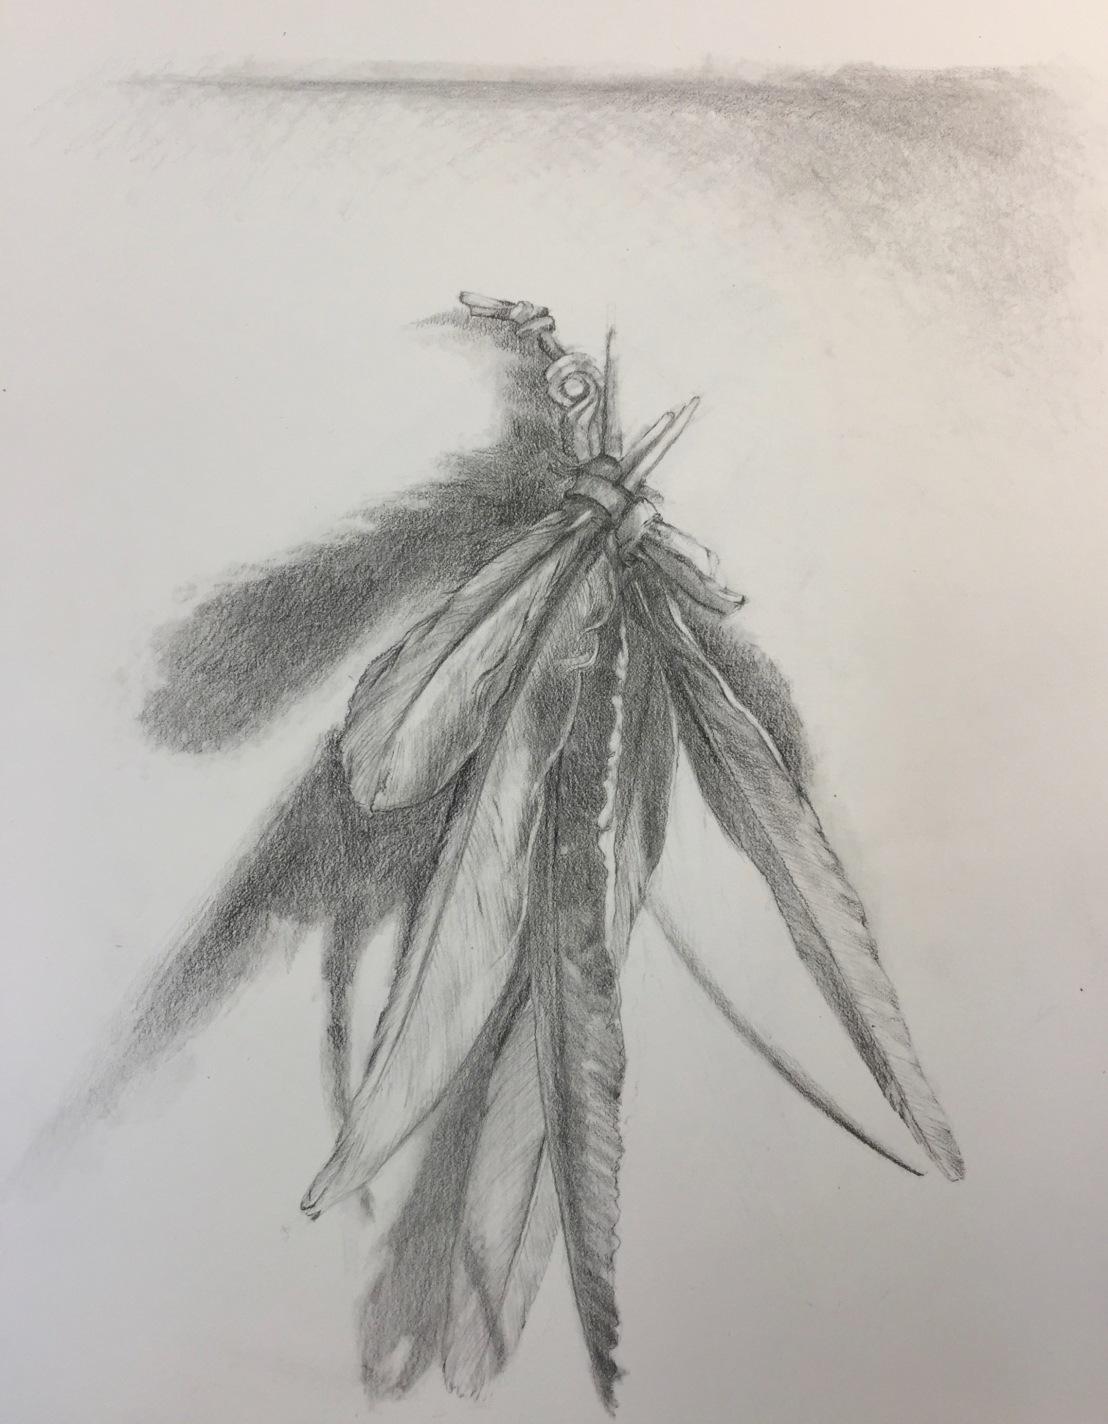 Celestial Wisdom Series, graphite